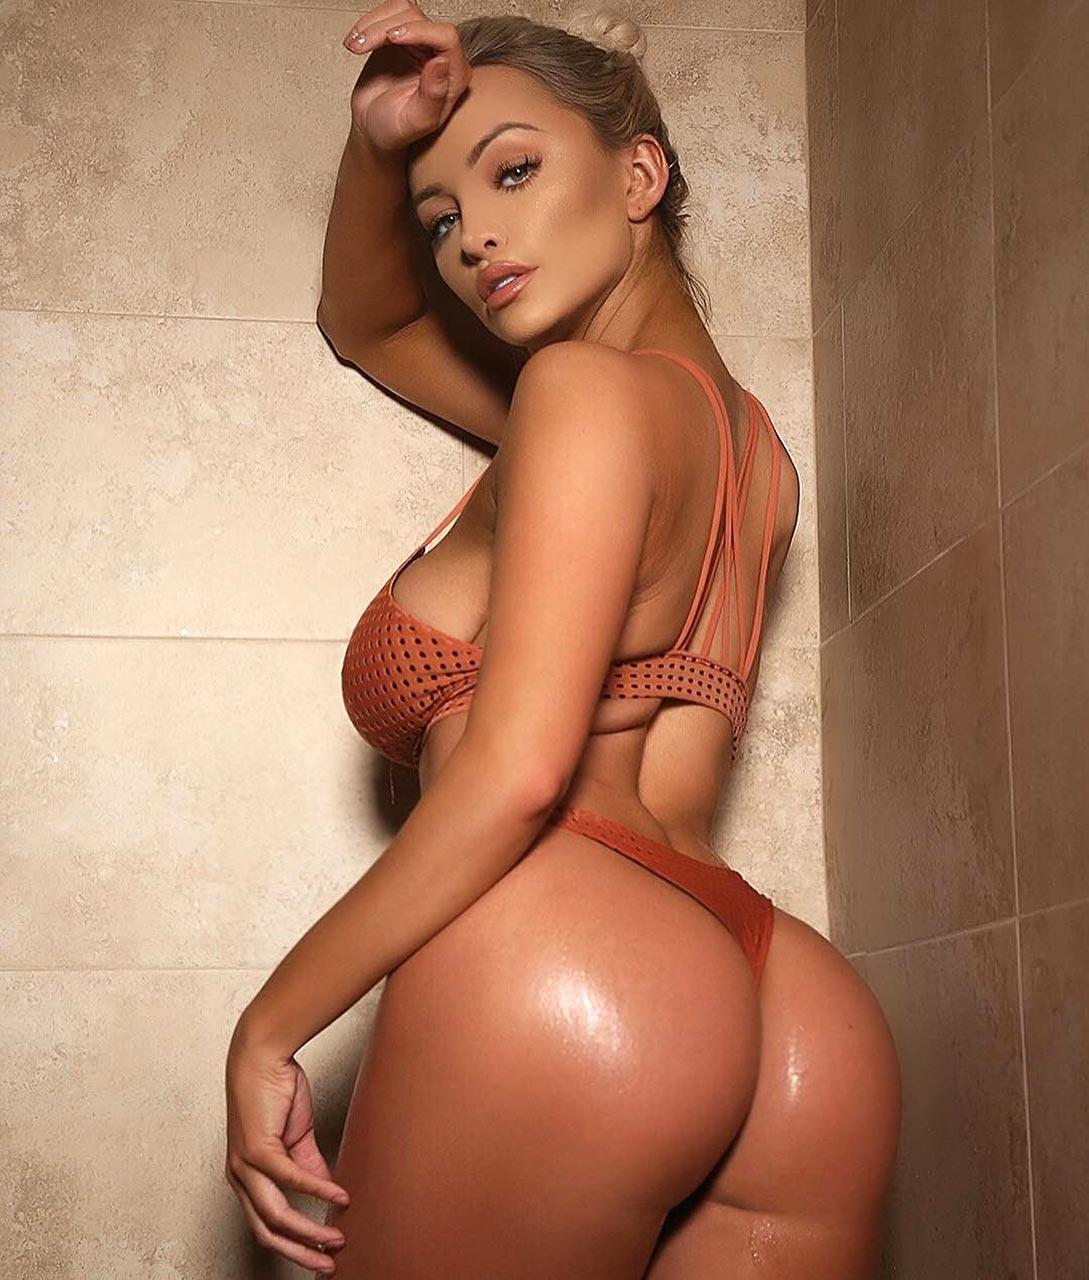 Lindsey pelas nudes